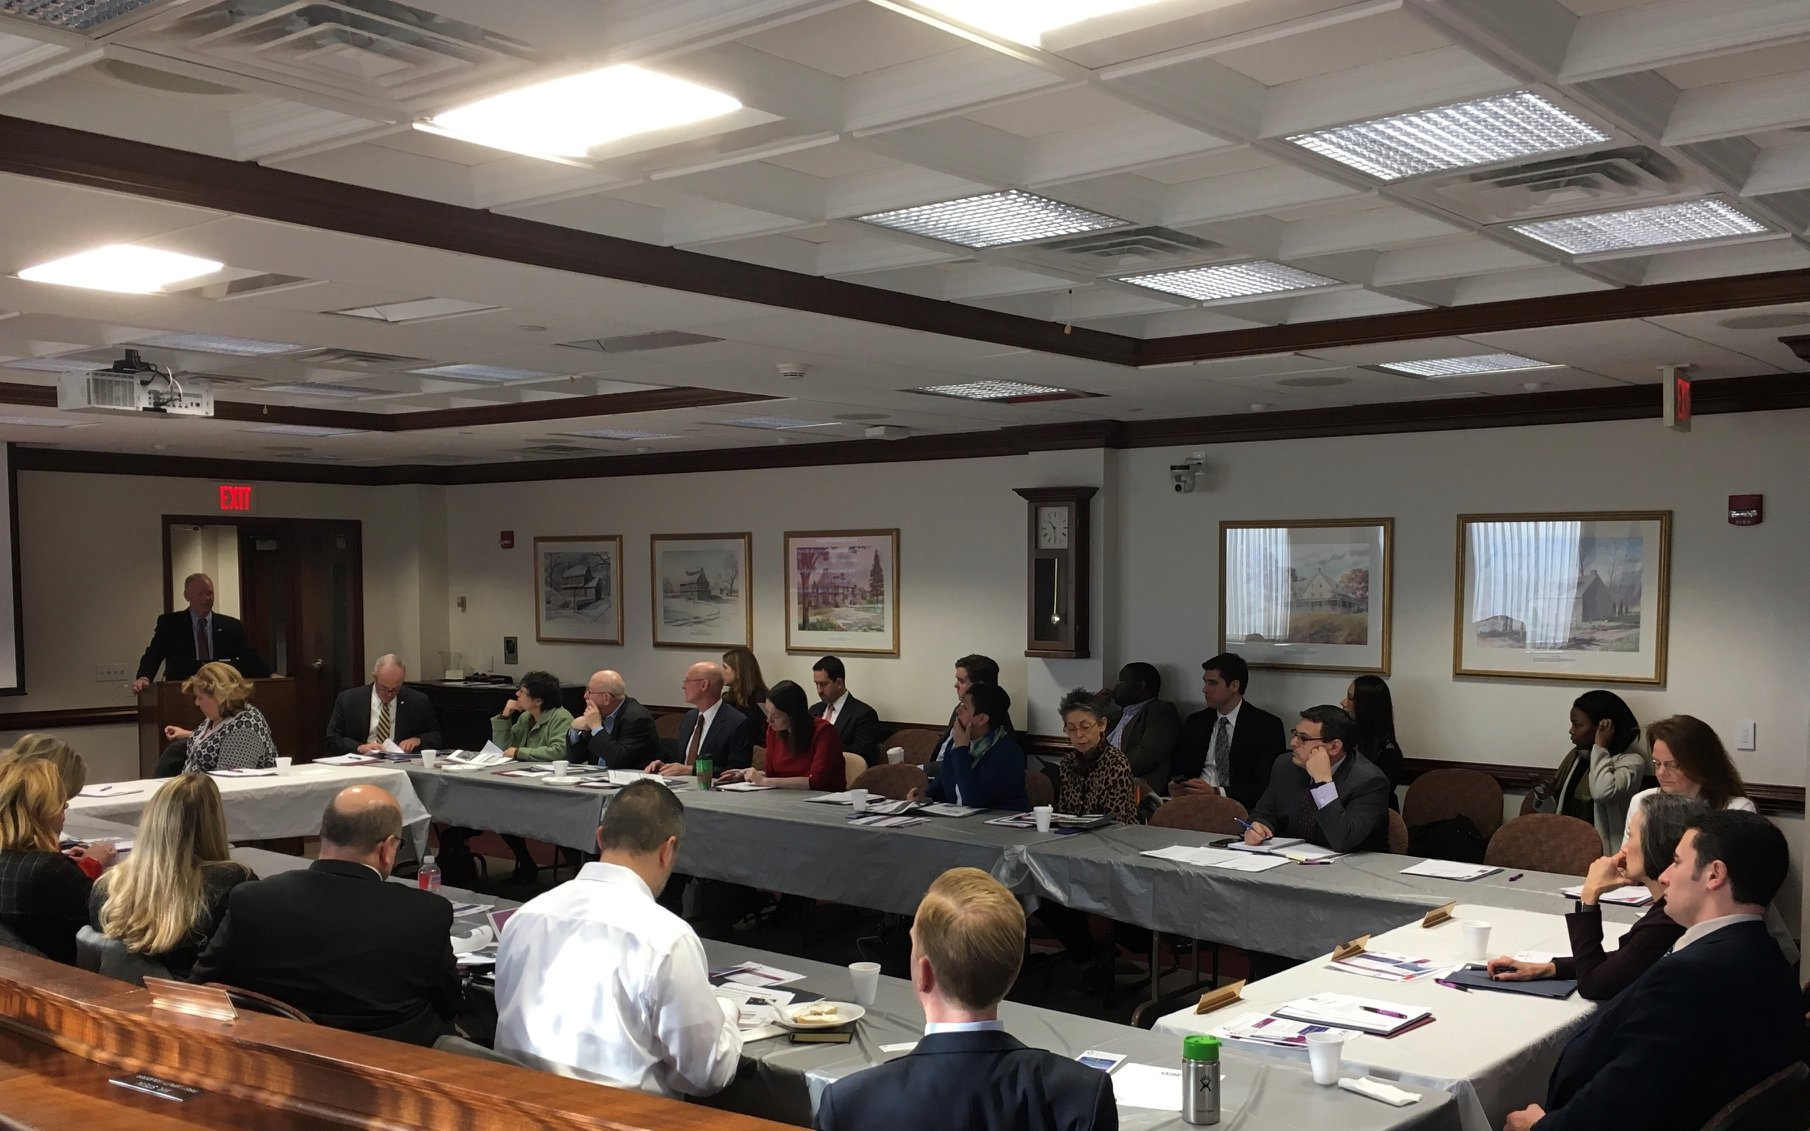 Montgomery County Legislative Session - Two.jpg